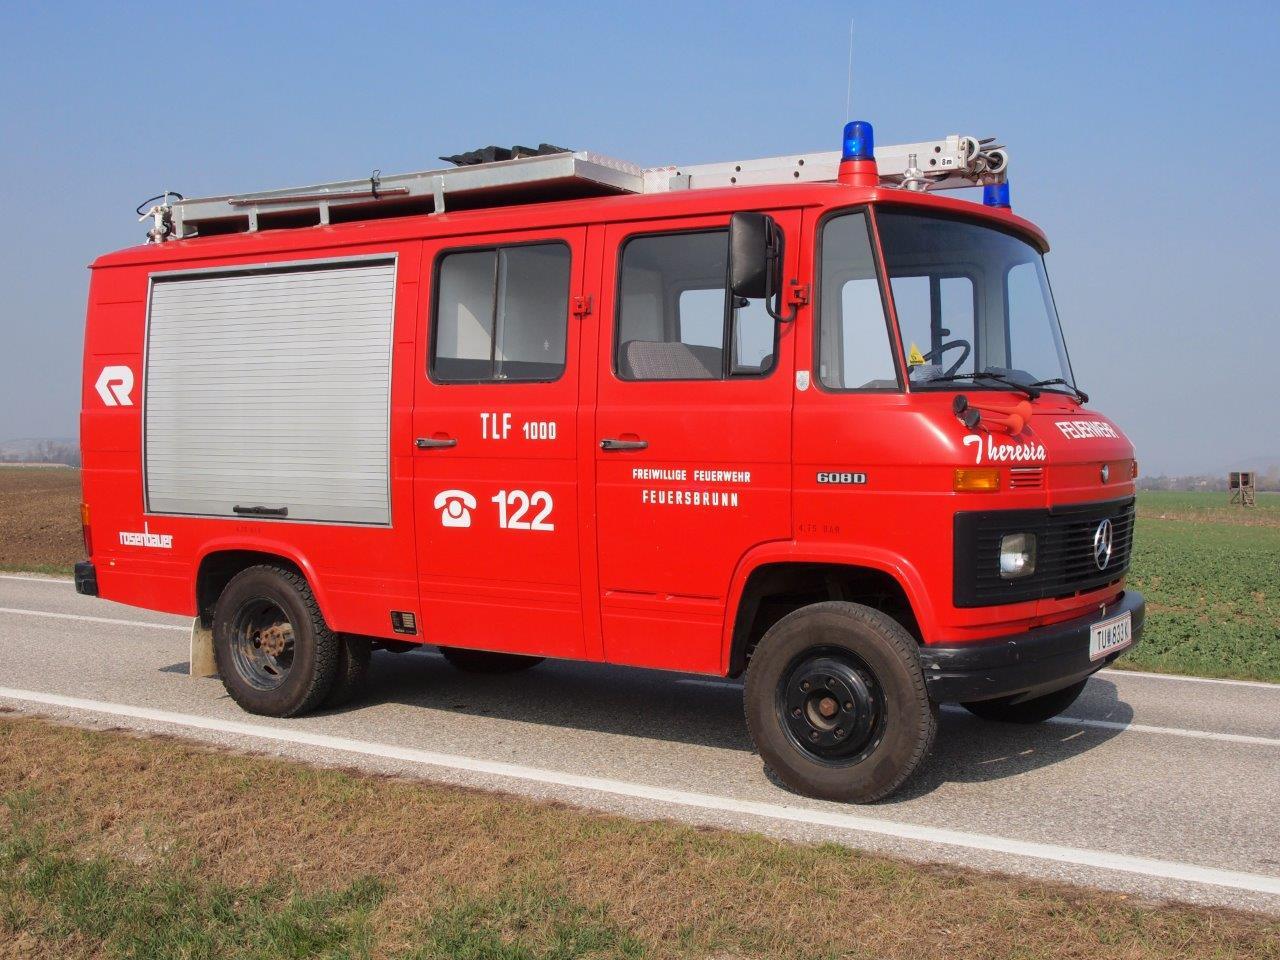 TLF 1000